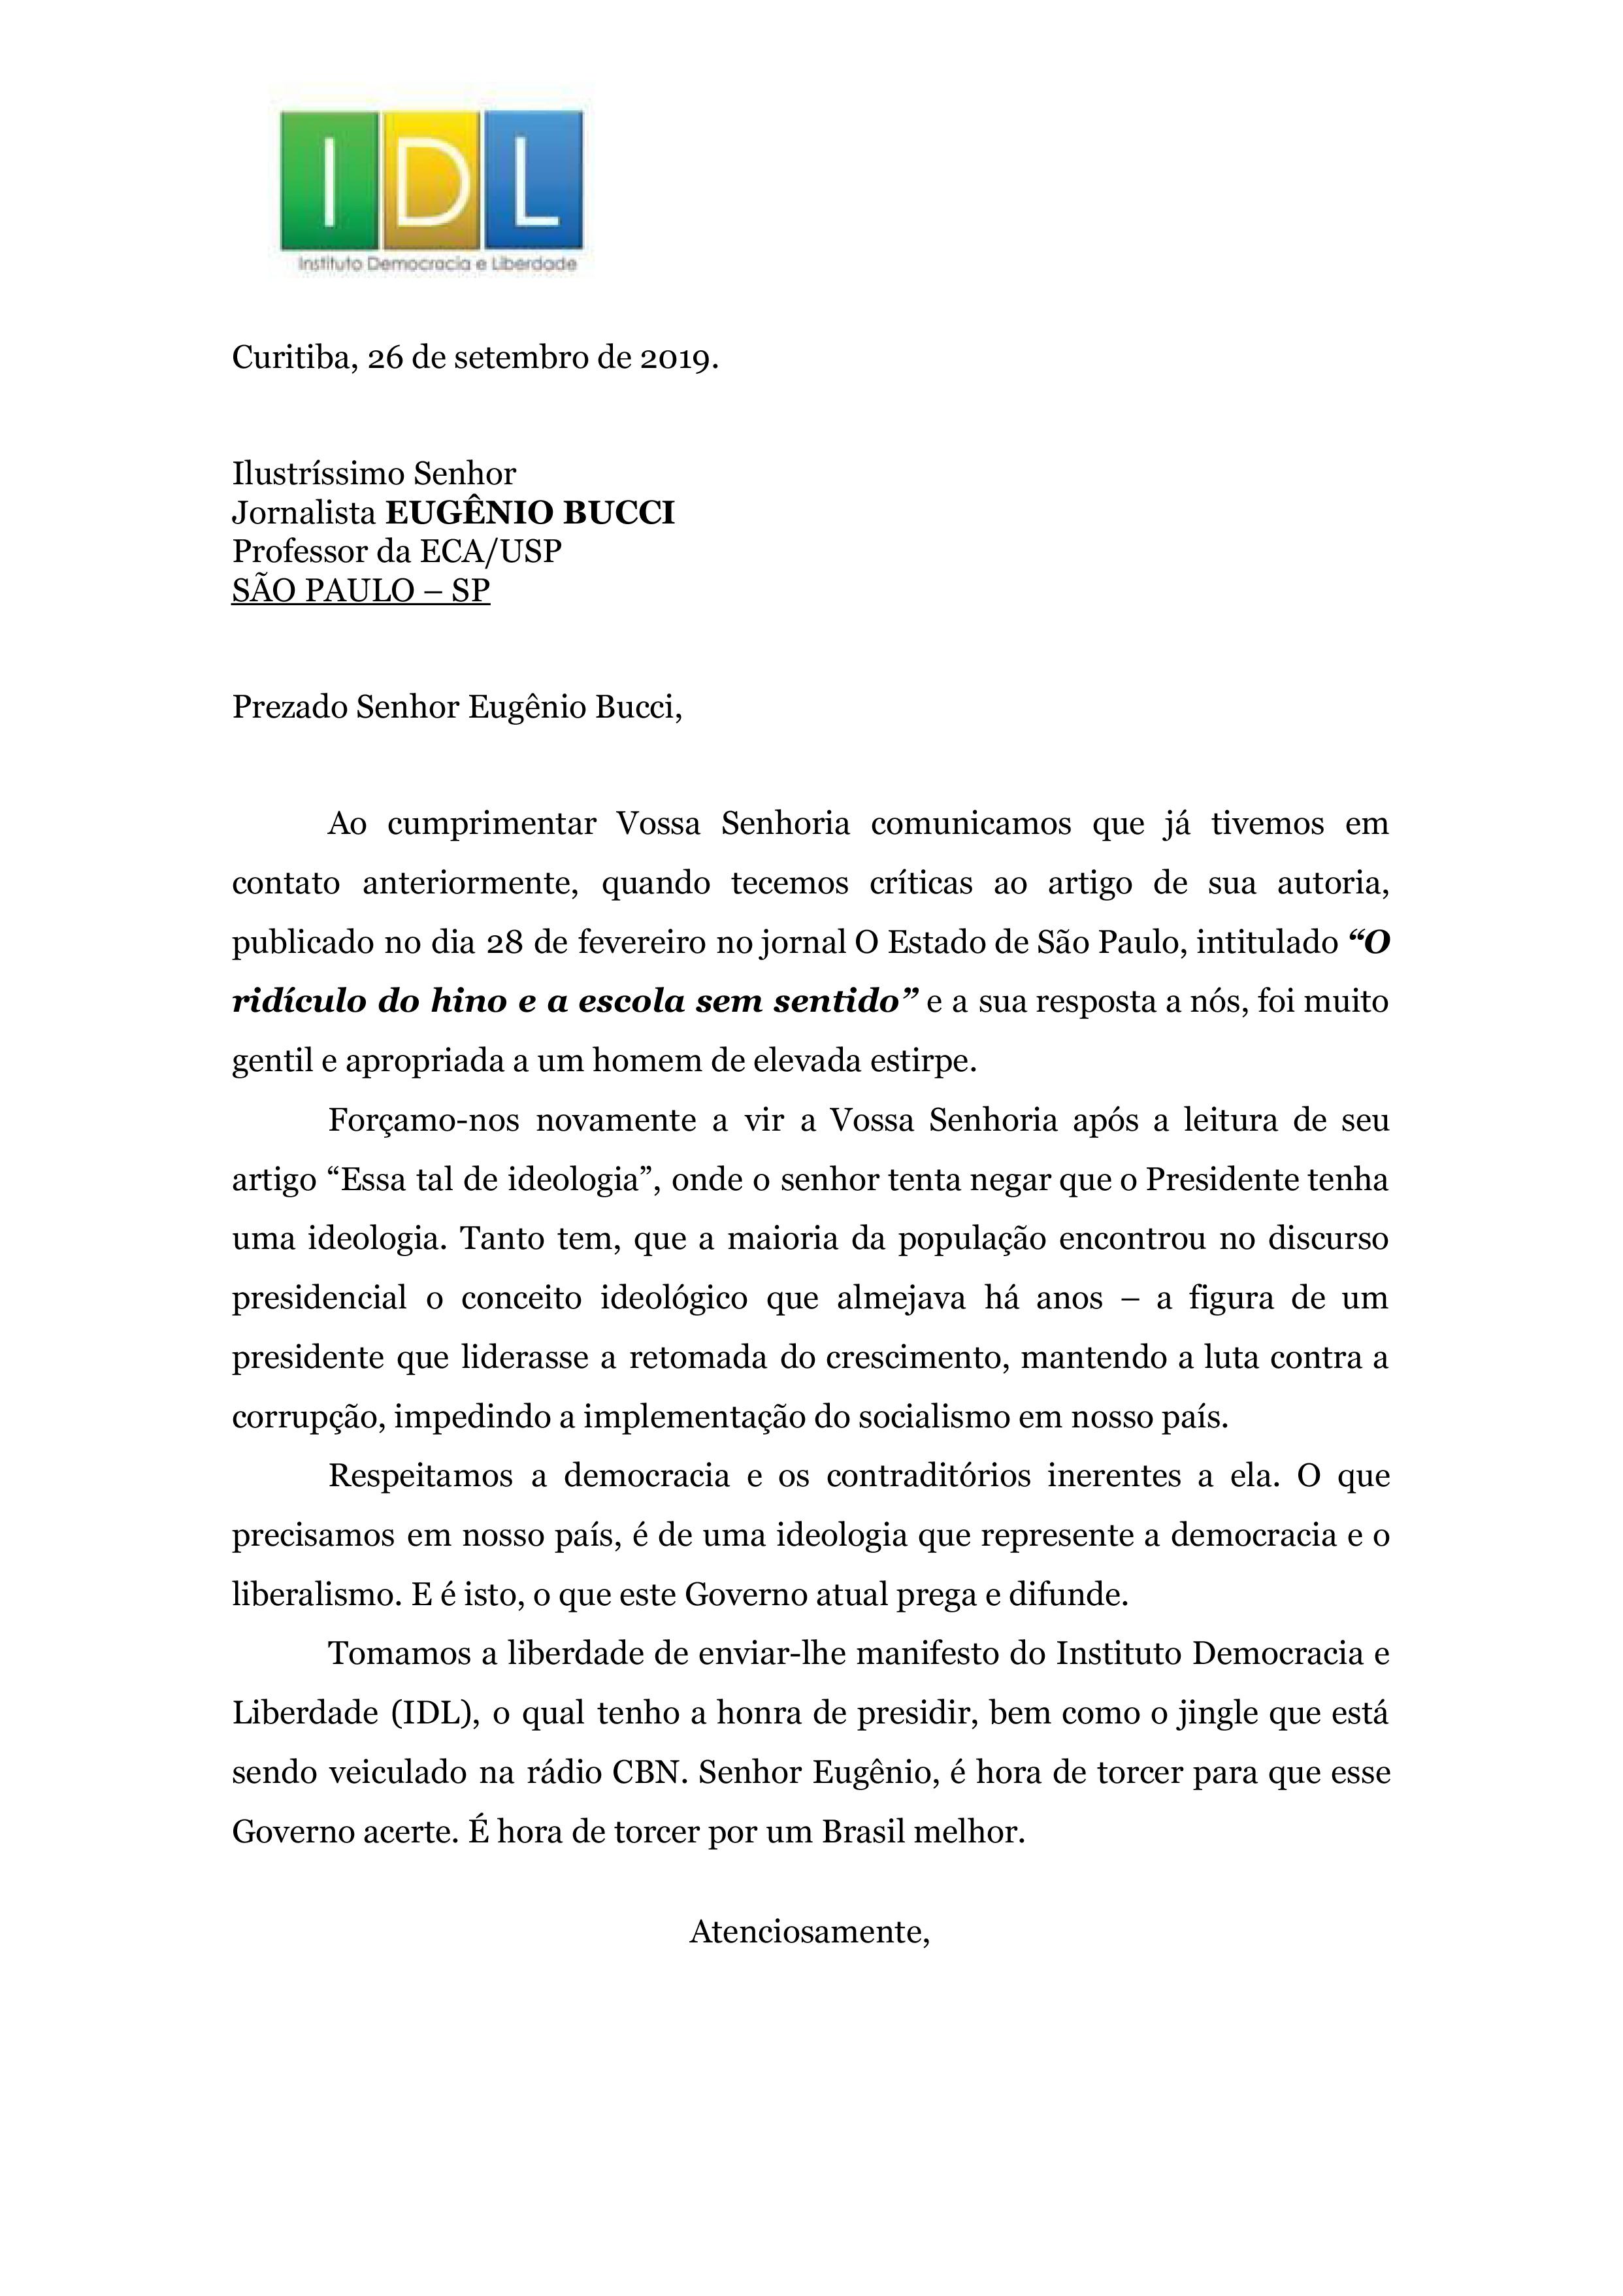 CARTA_Eugenio Bucci (1)-1